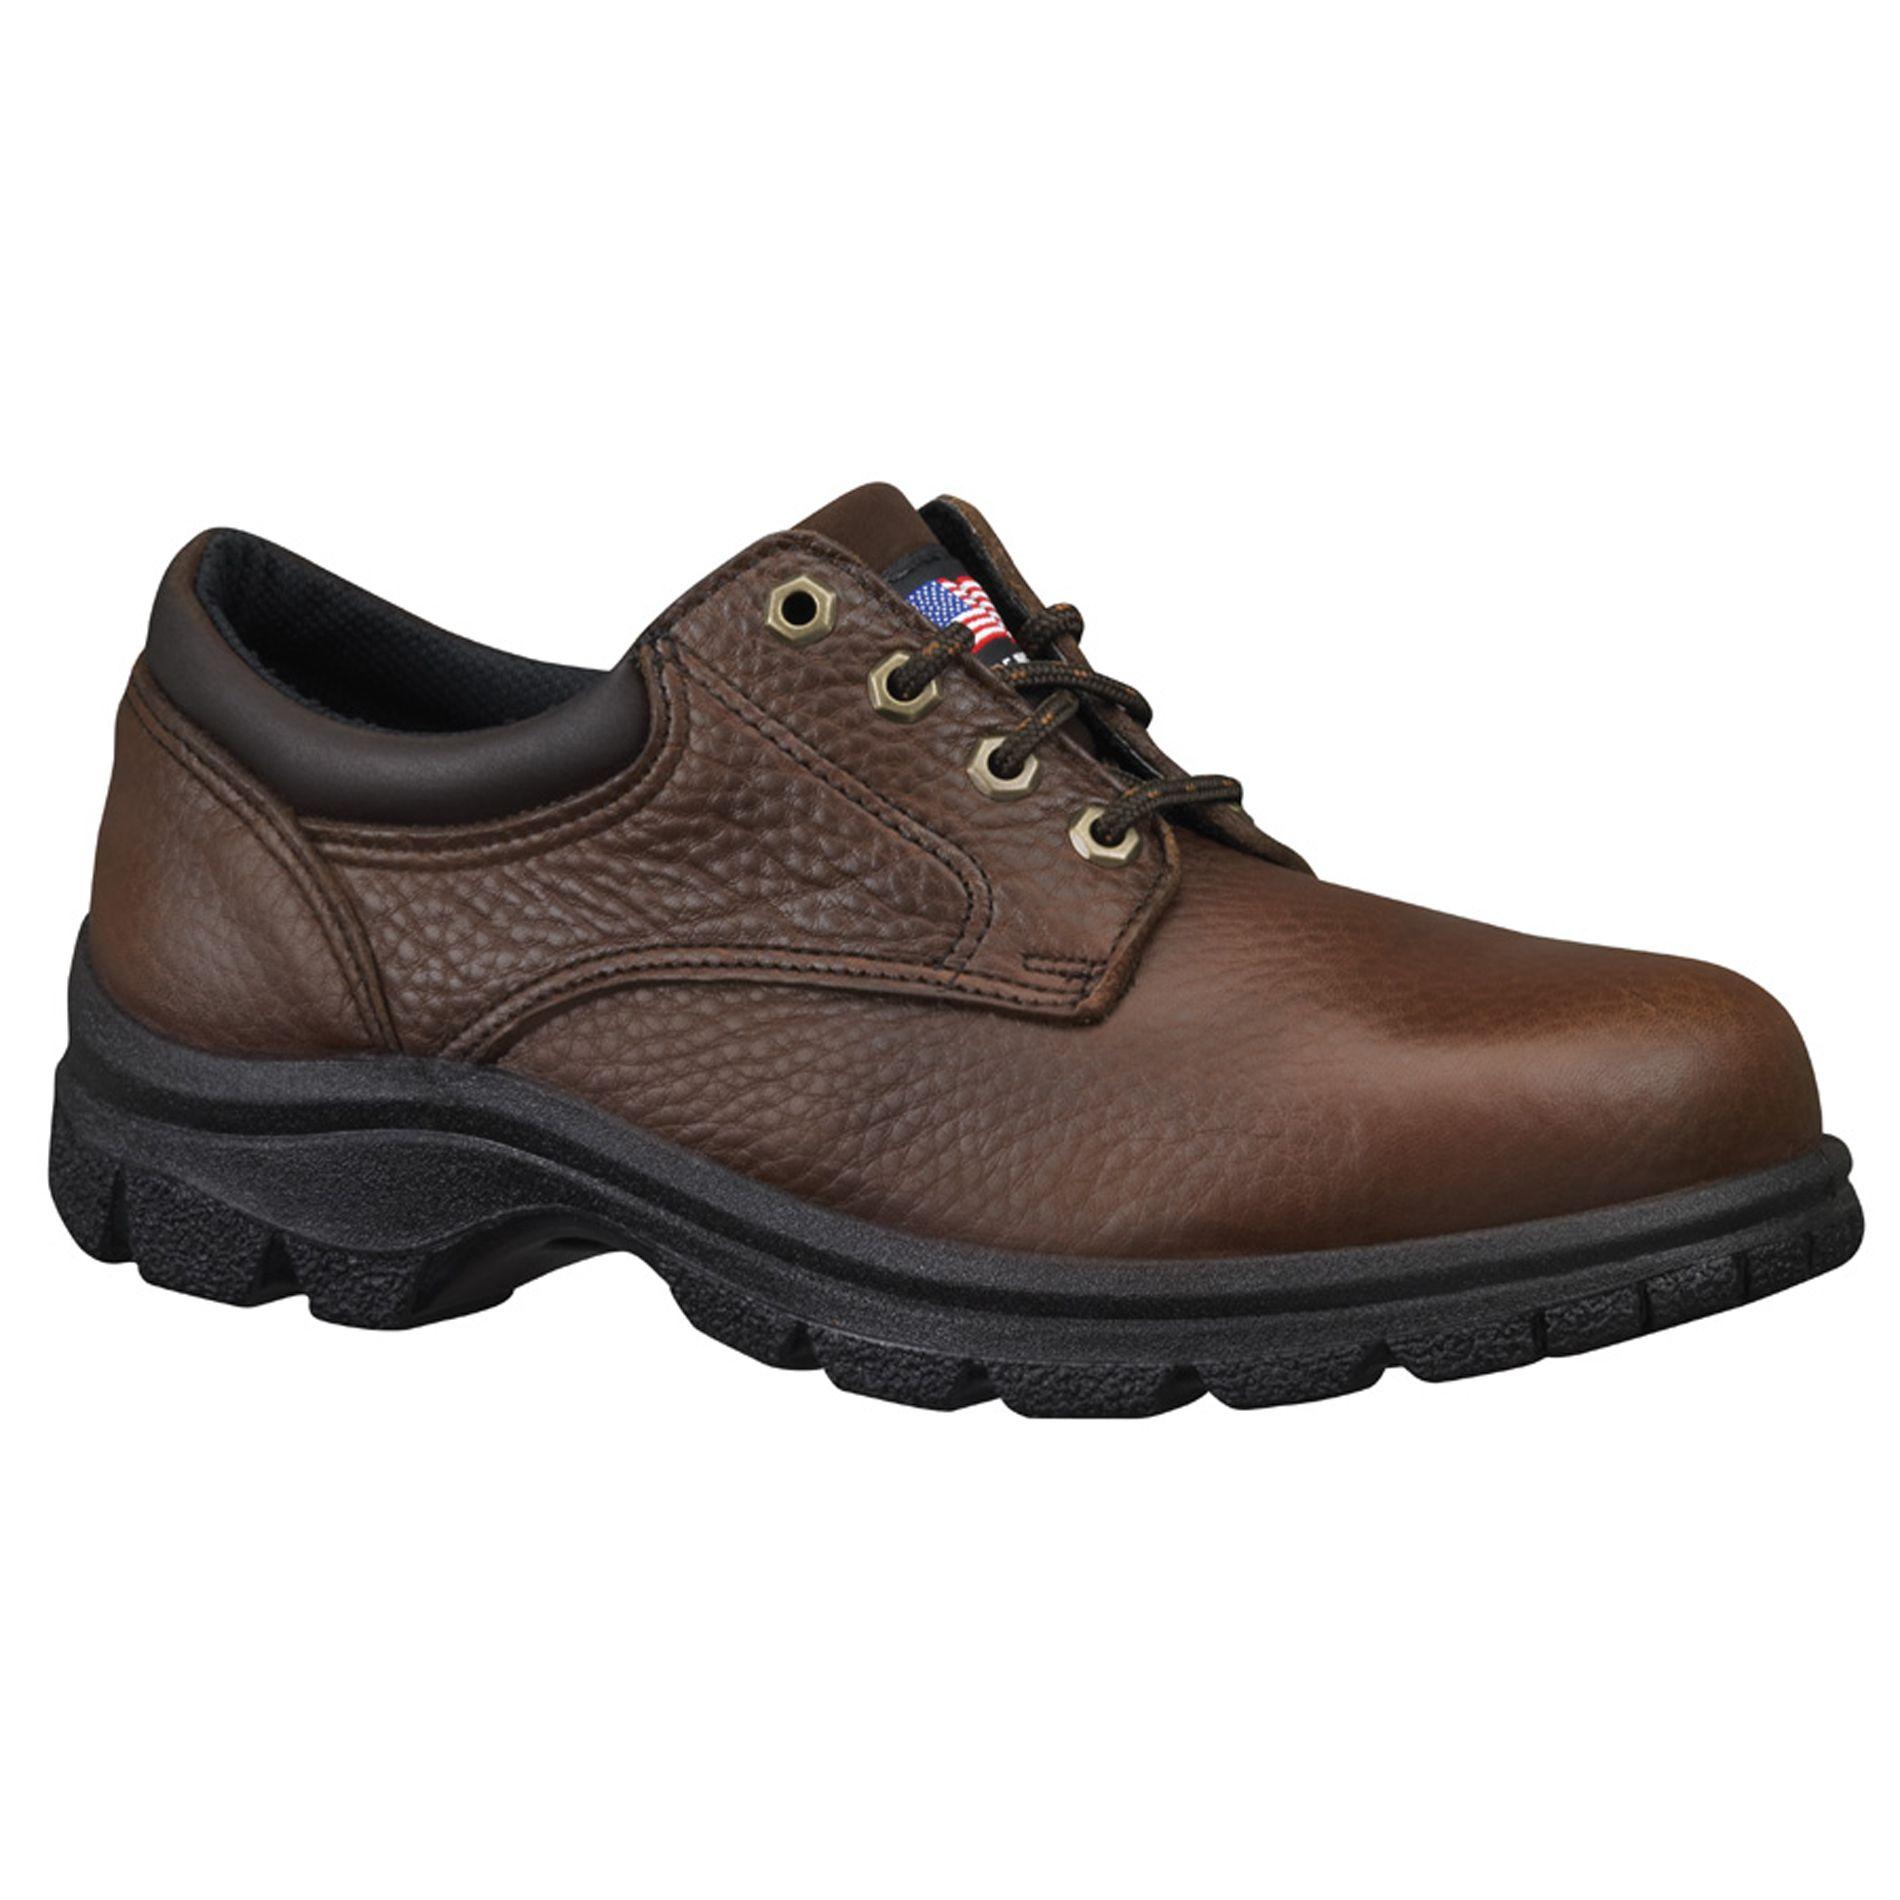 Thorogood Men's American Heritage 804-4760 Brown Steel Toe Work Shoes - Wide Width Available